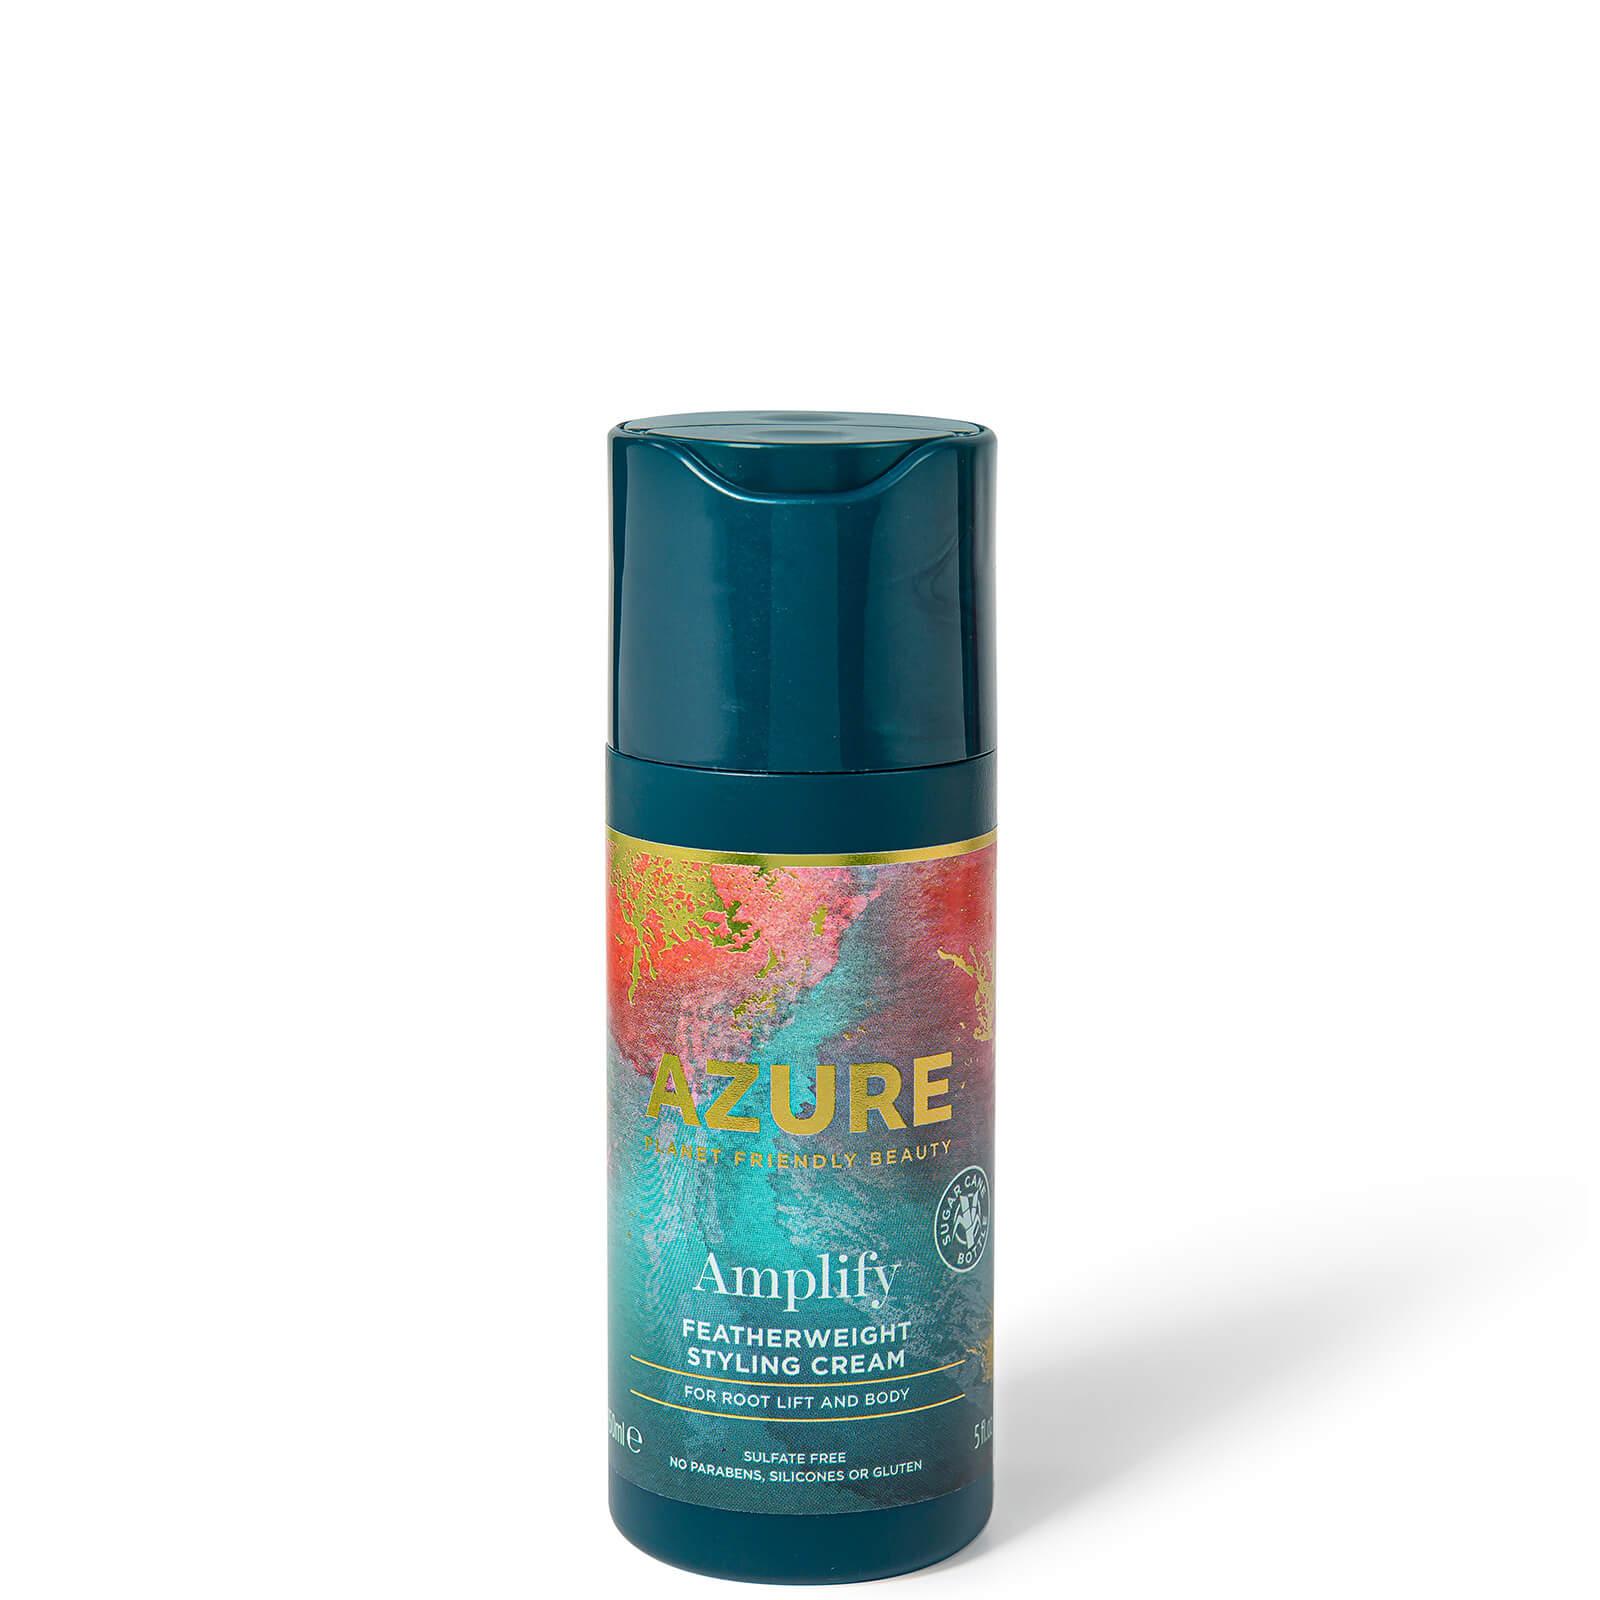 Купить Azure Featherweight Styling Cream 150ml